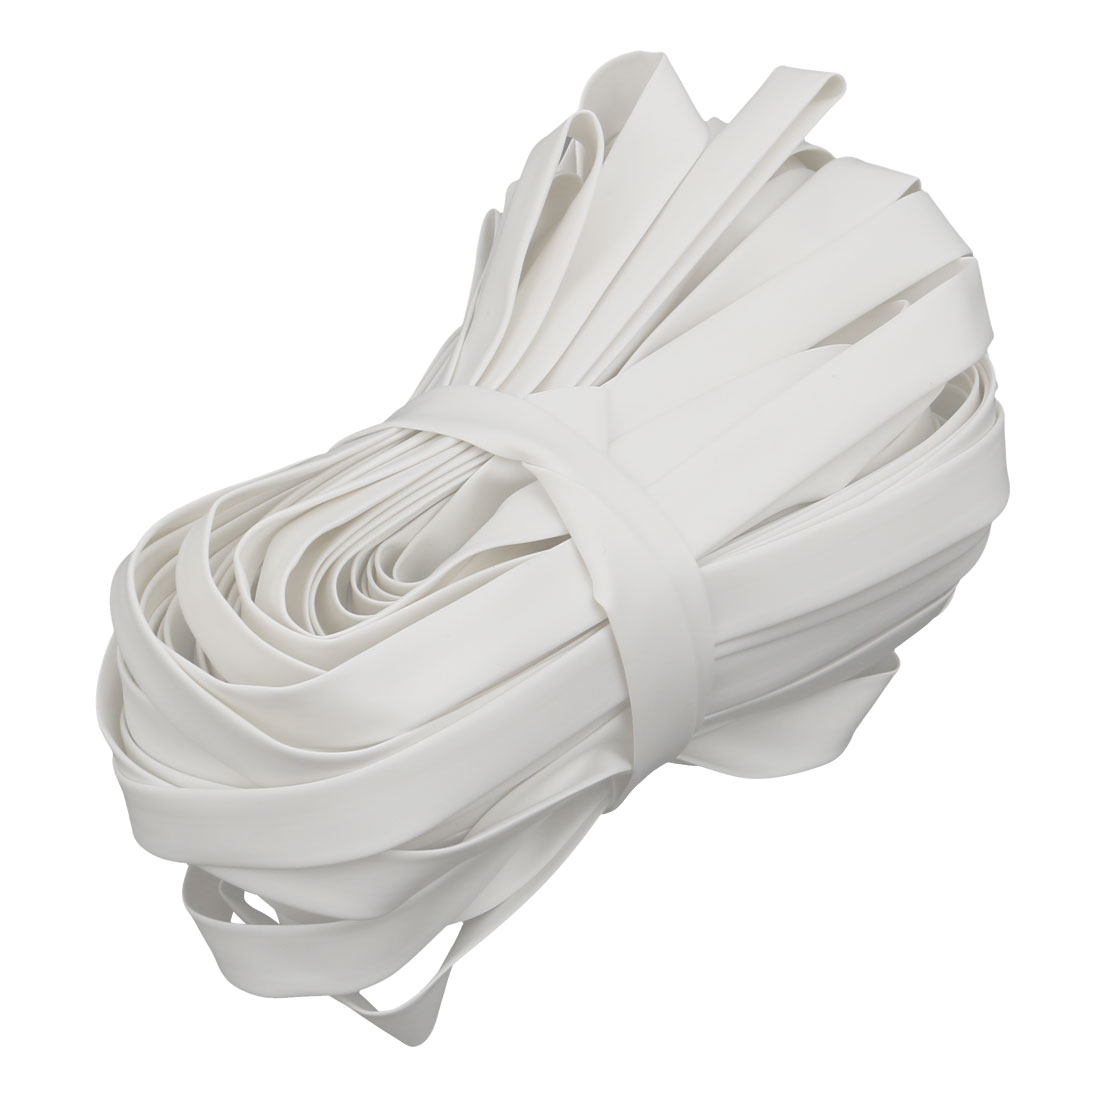 65.6Ft Length 7mm Inner Dia Insulated Heat Shrink Tube Sleeve Wire Wrap White